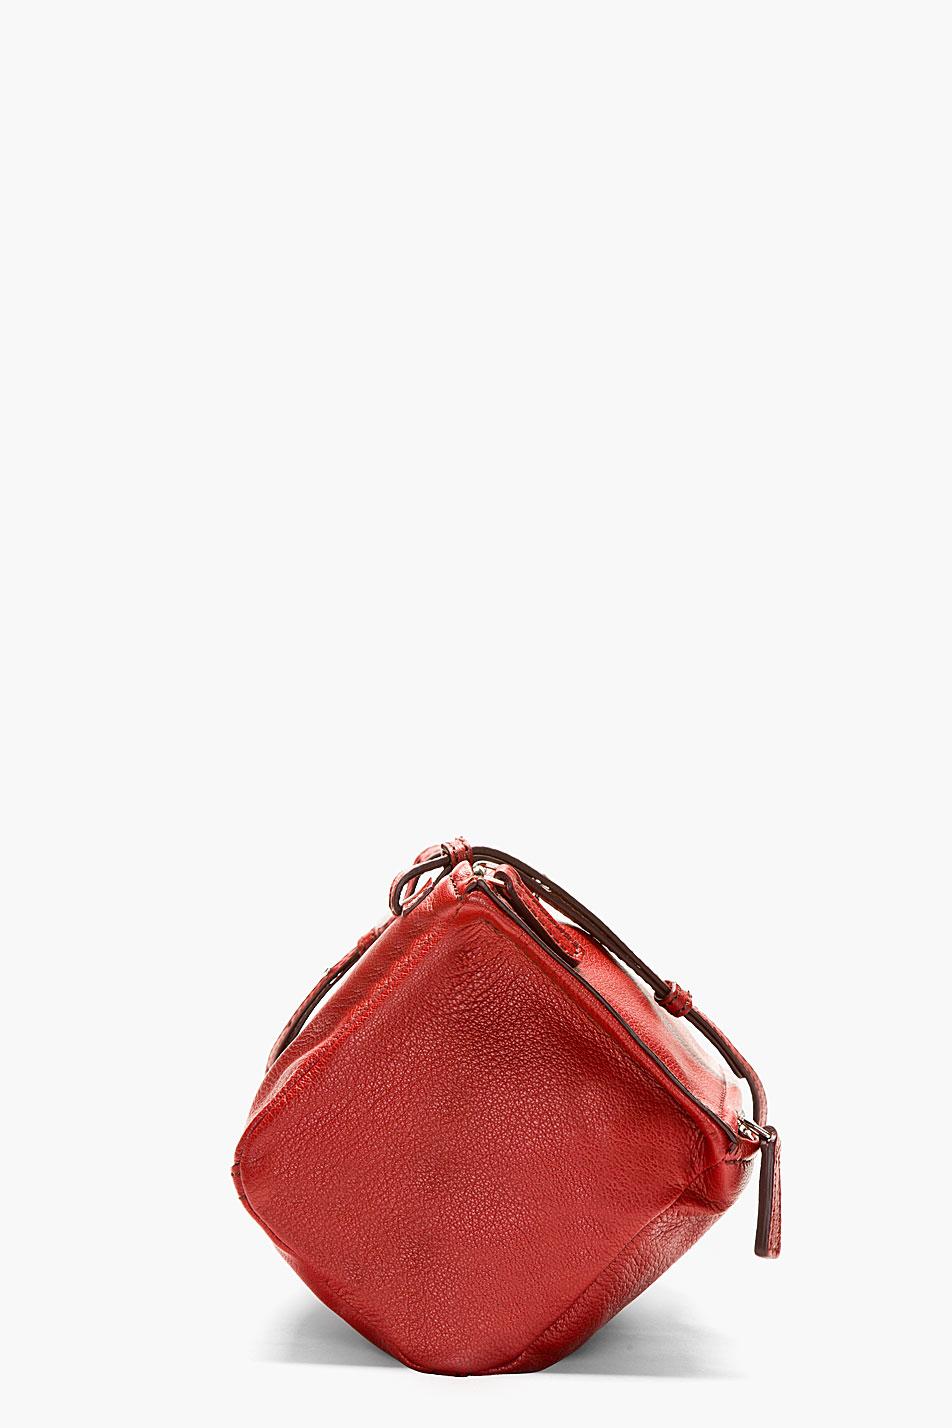 2b1f0d2965d Lyst - Givenchy Red Goatskin Pandora Sugar Mini Shoulder Bag in Red